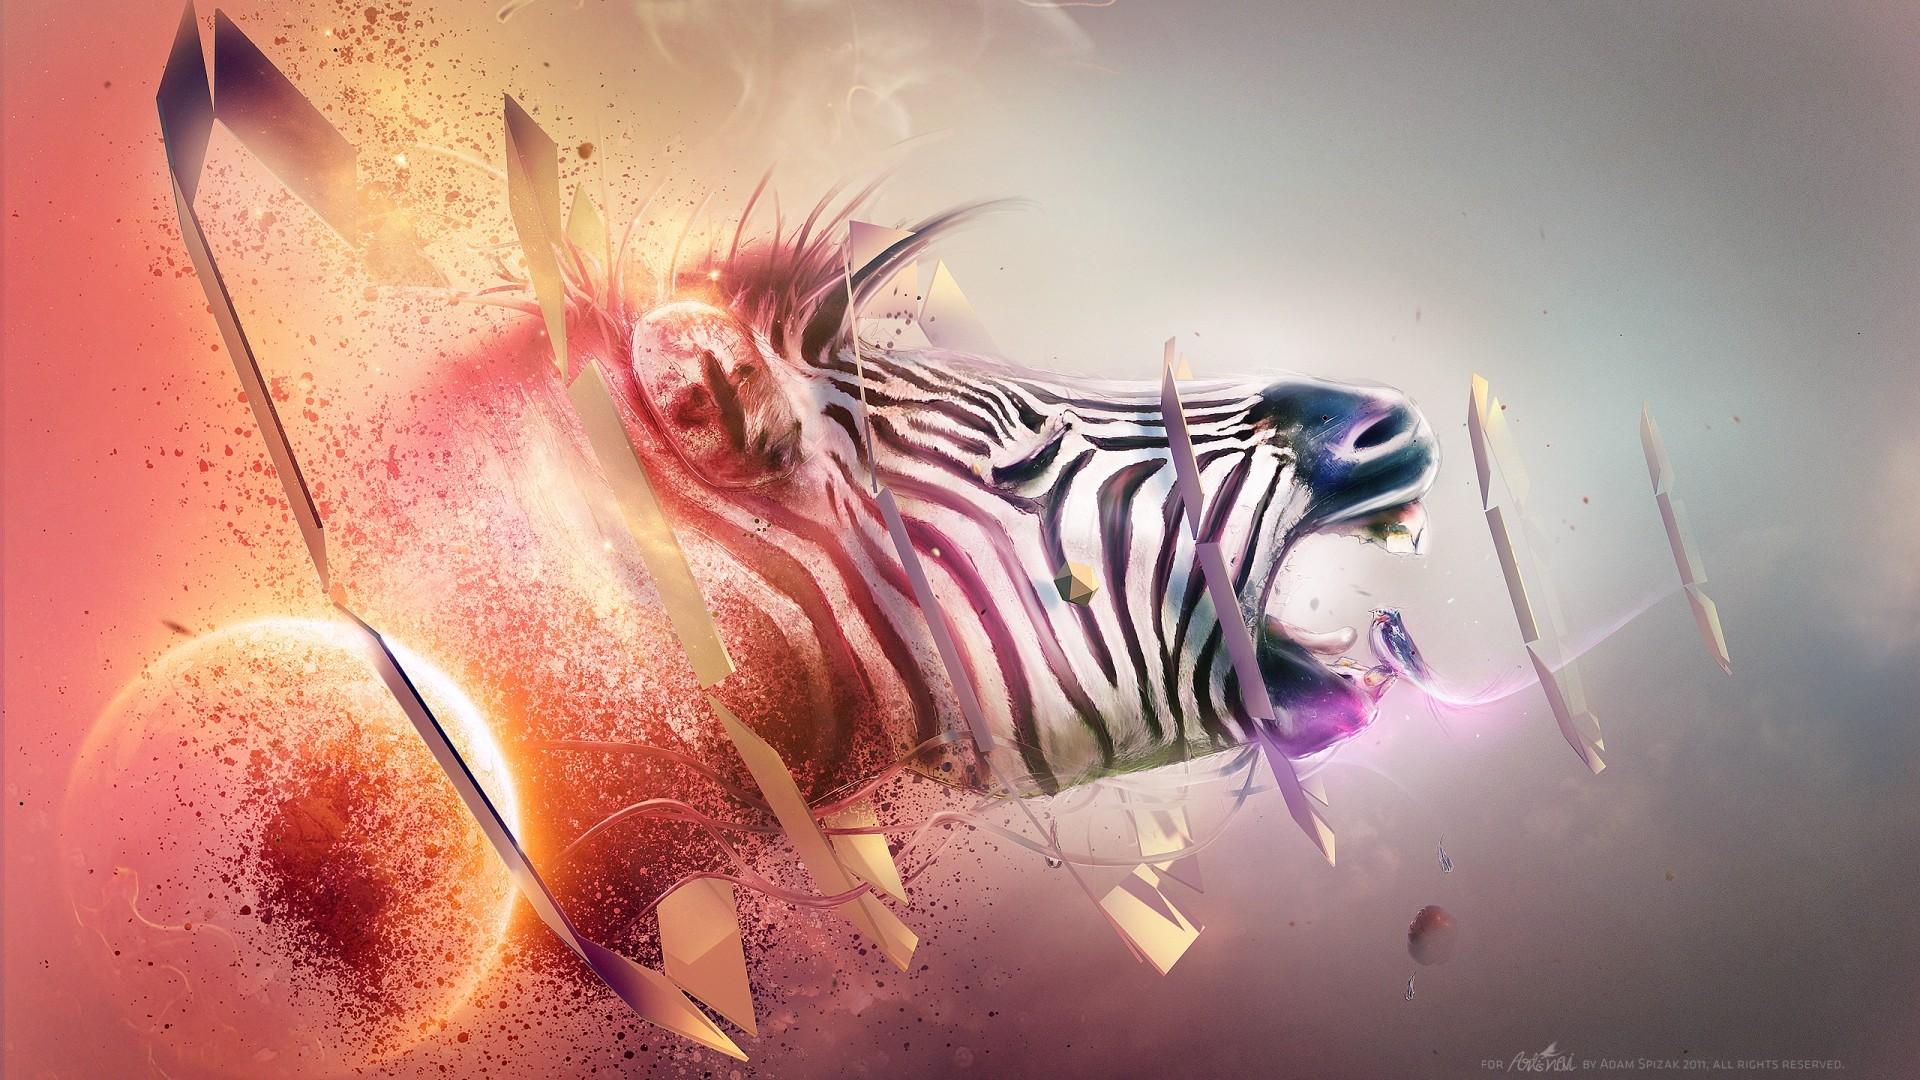 Hd Animal Wallpapers Hd Music Wallpapers: Animal HD Wallpaper